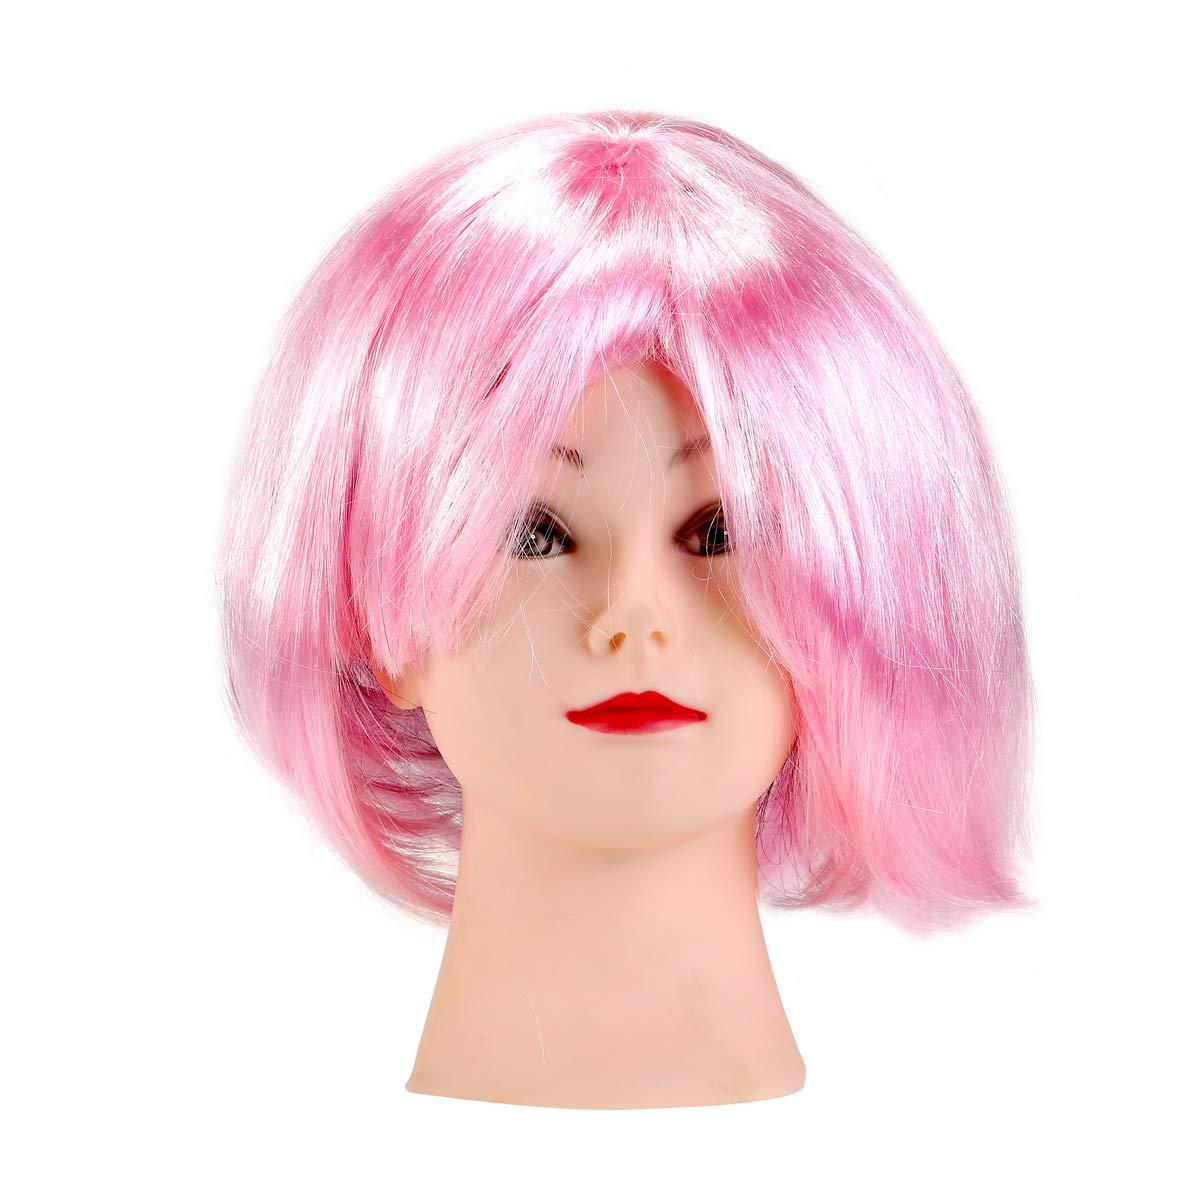 BinaryABC Halloween Bob Wigs,Cosplay Wigs for Halloween Costume Dress up Party Decorations Supplies